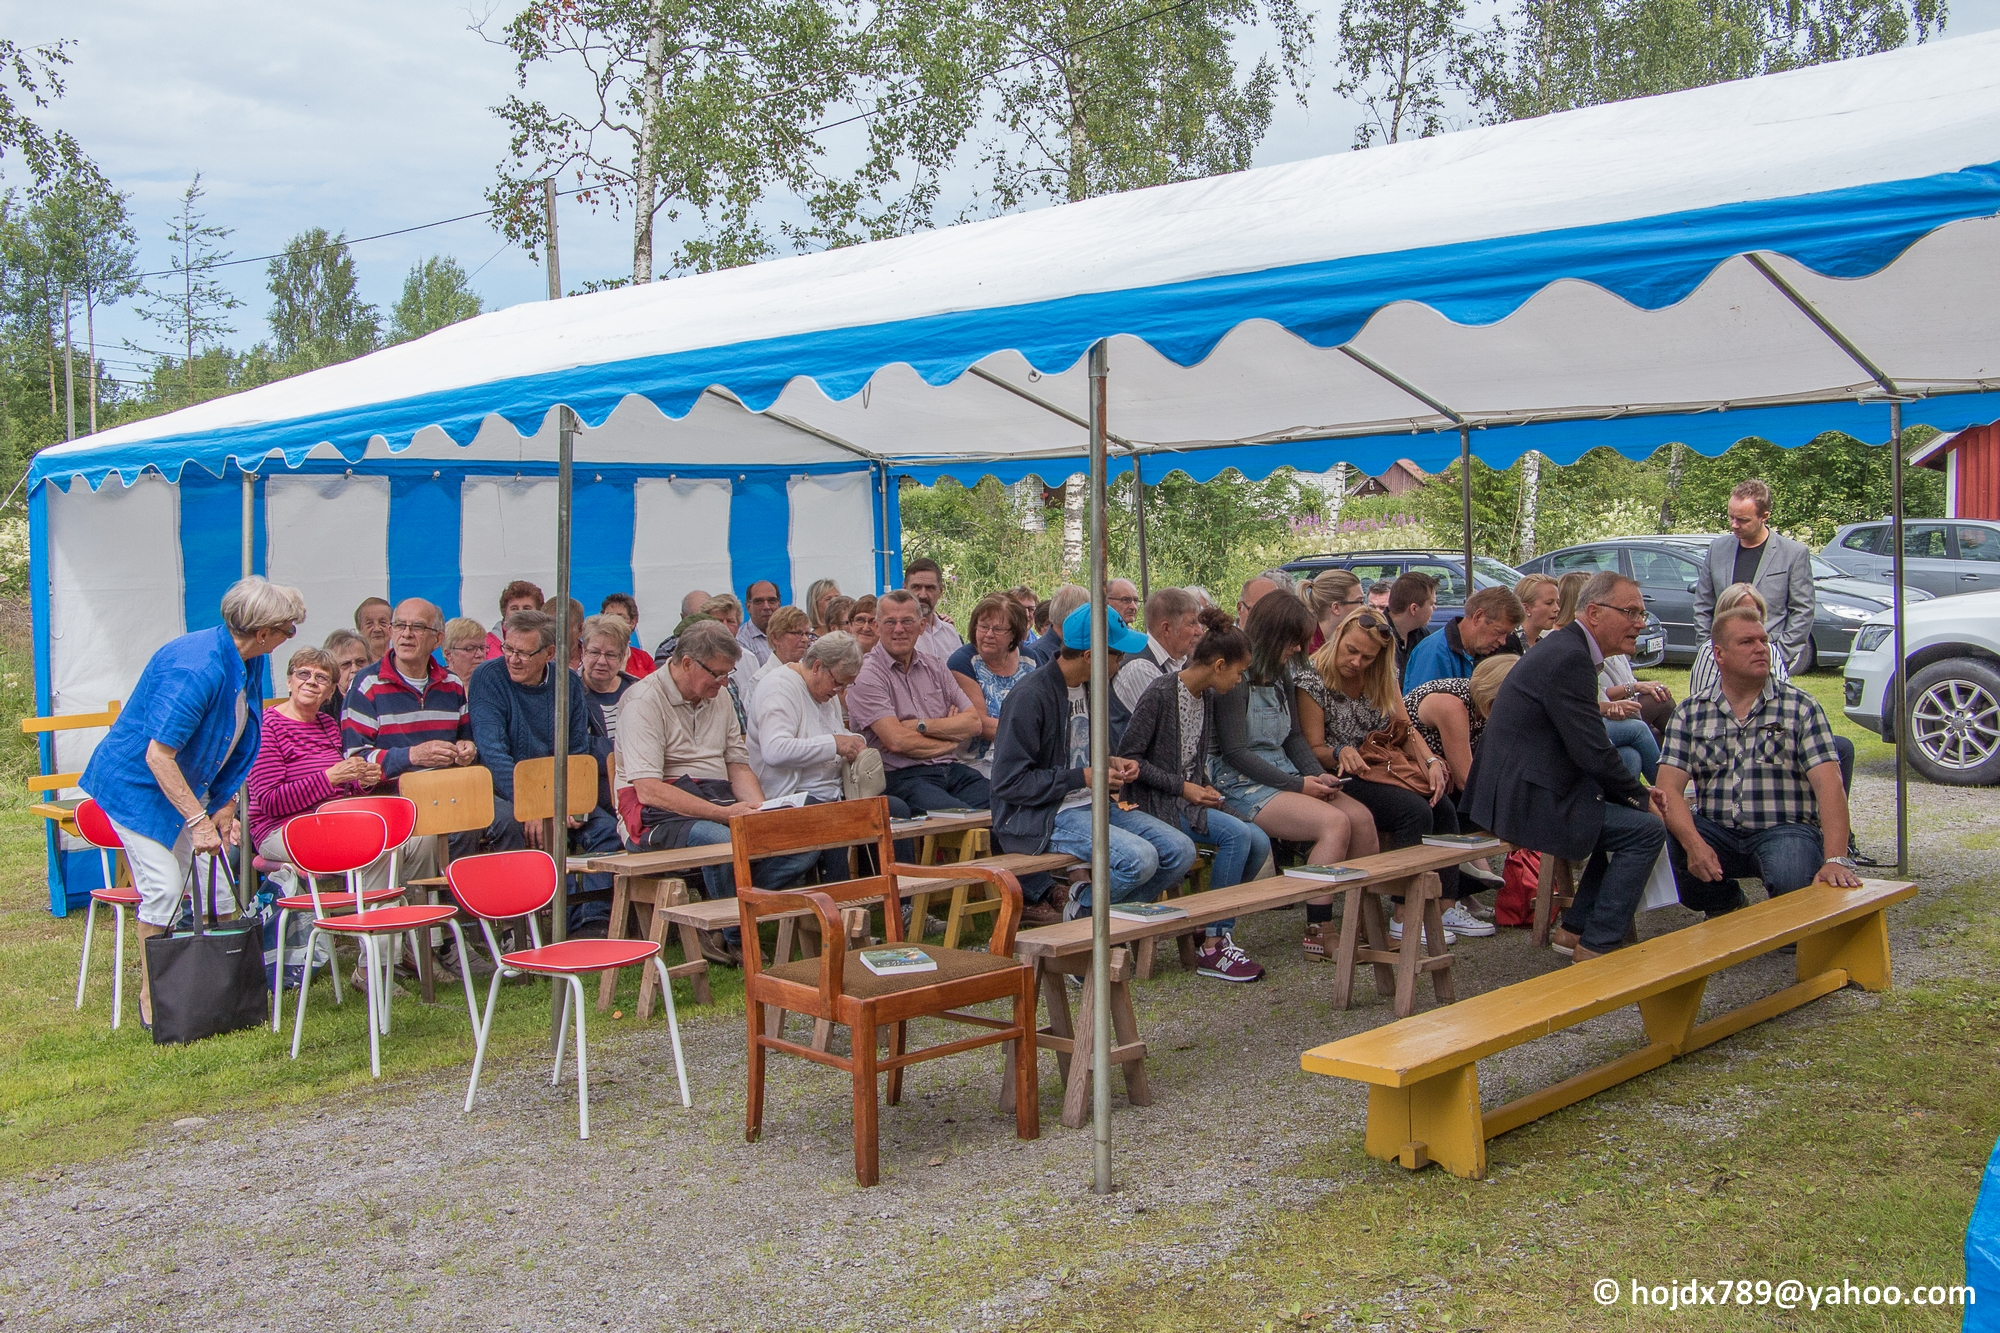 2016-07-10 Byadagen i Oxkangar